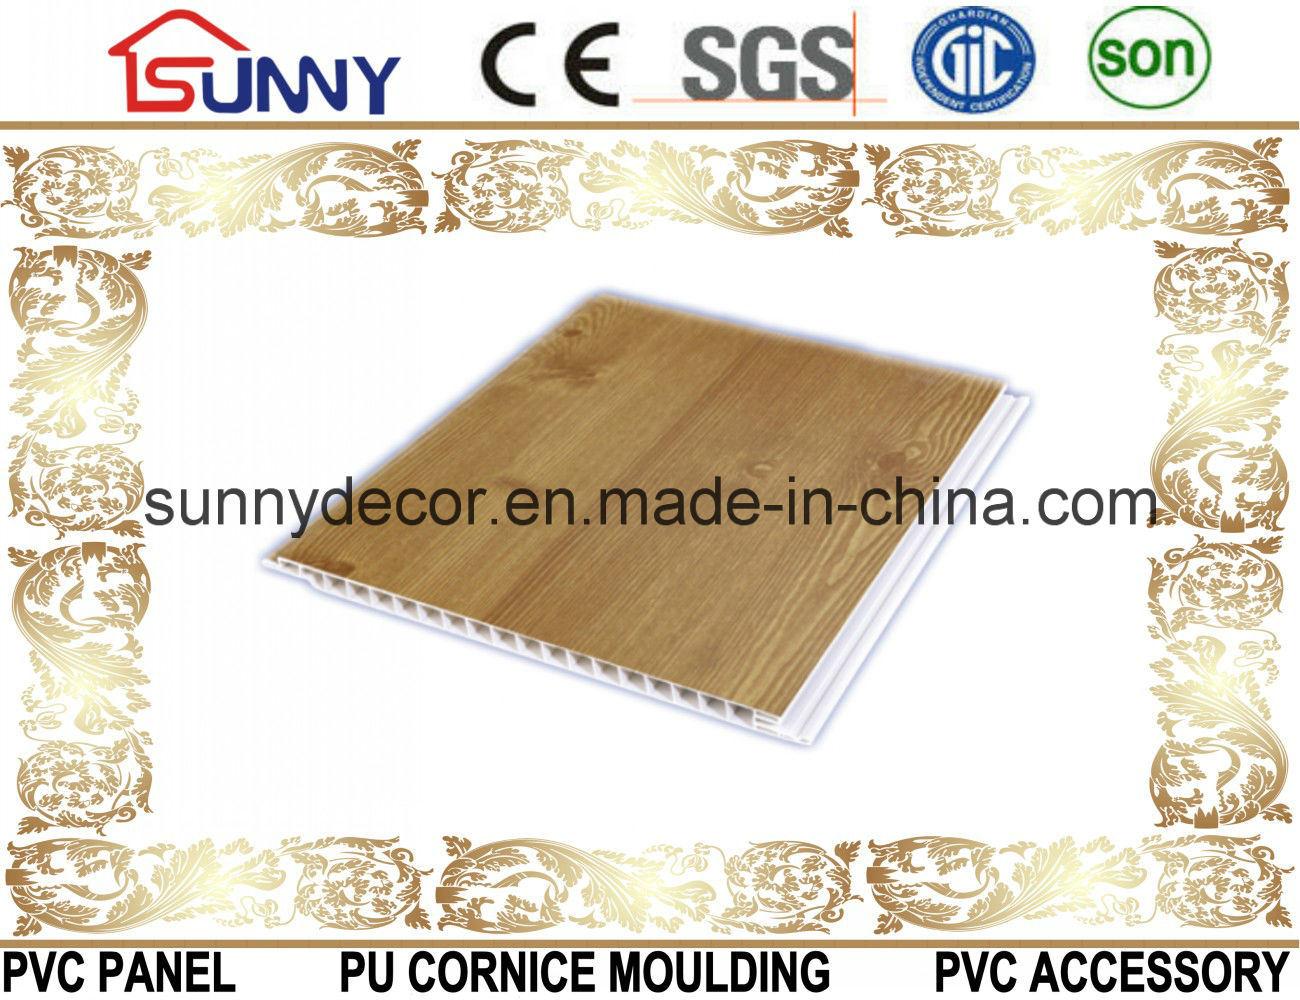 Building Materials Plastic Lamination Panel PVC Ceiling Design, Decorative Wall Panel